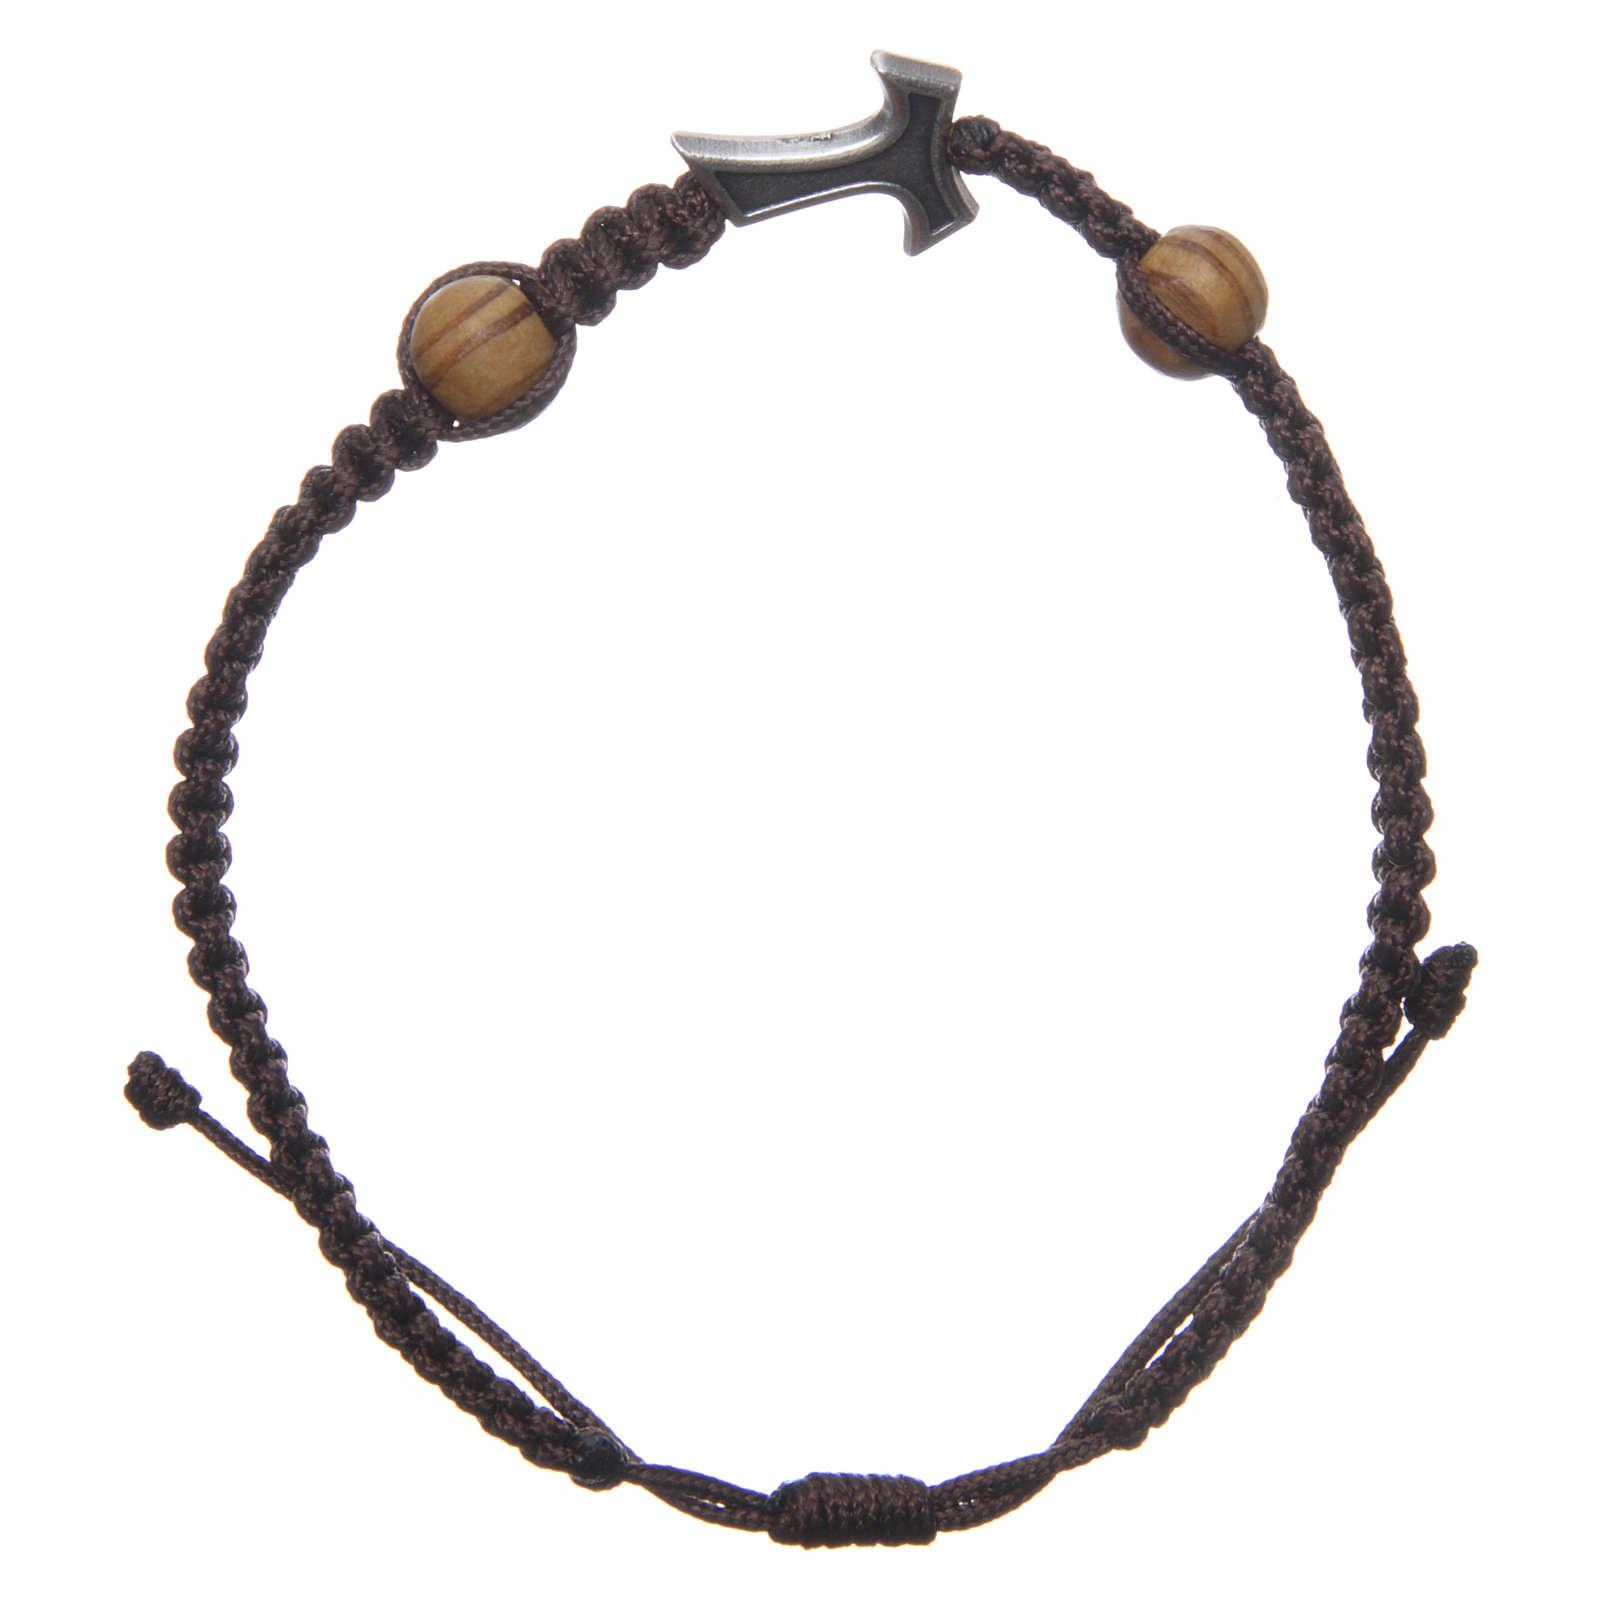 Bracelet Medjugorje corde marron croix tau 2 grains 4